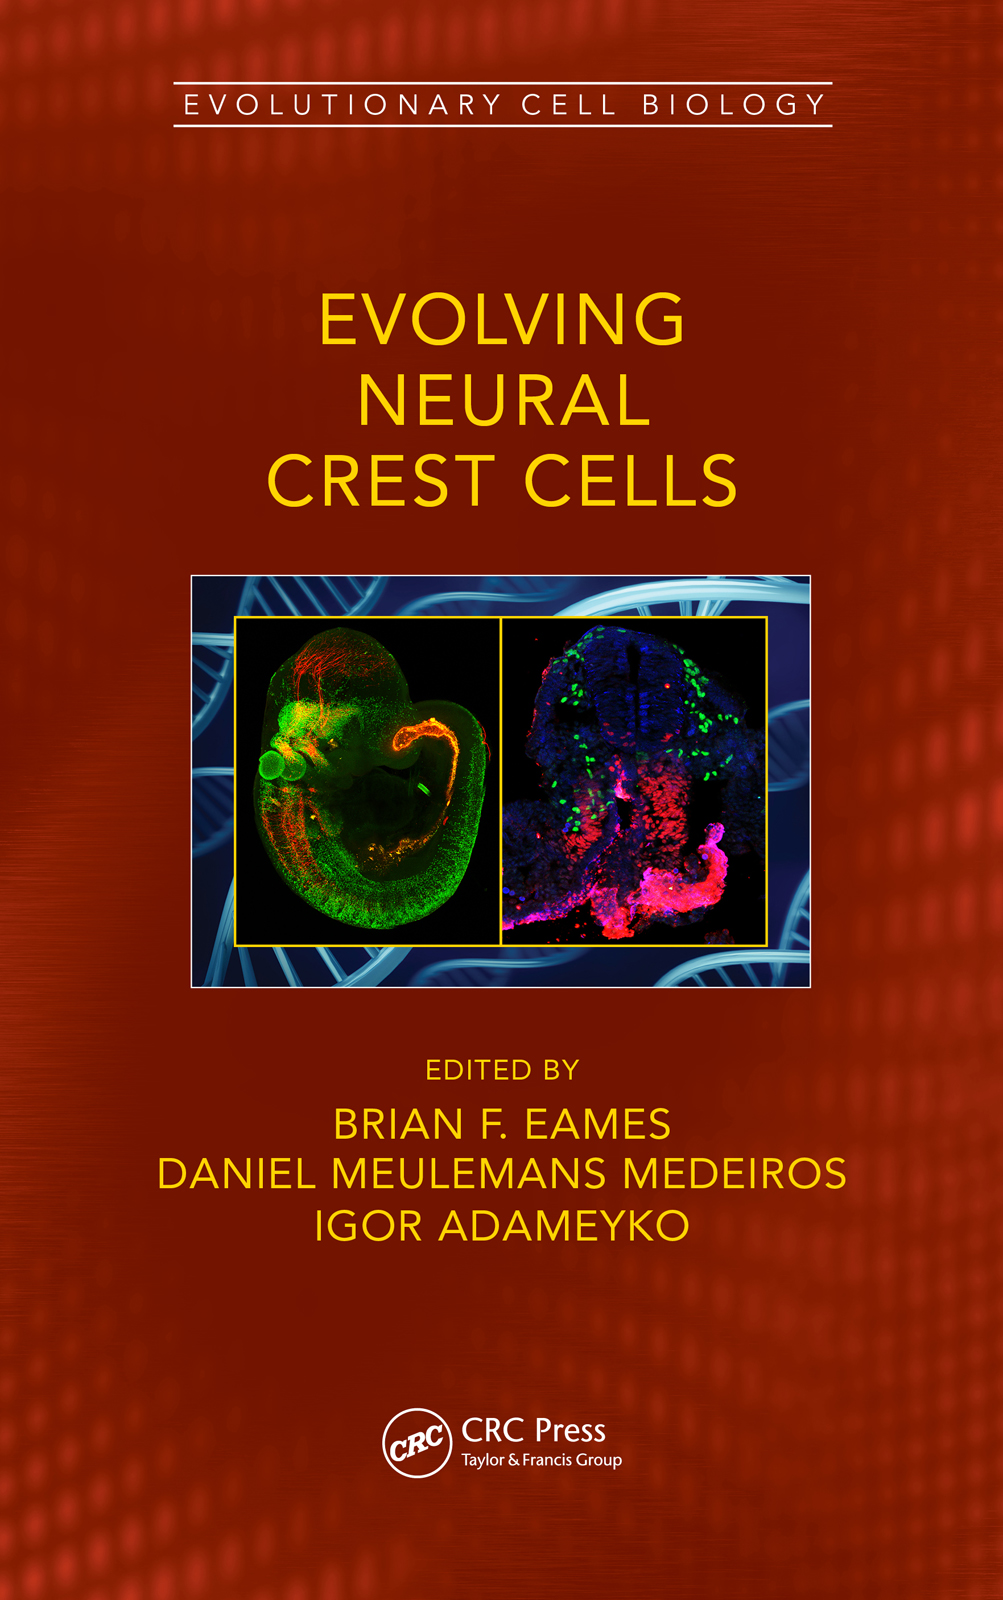 Evolving Neural Crest Cells